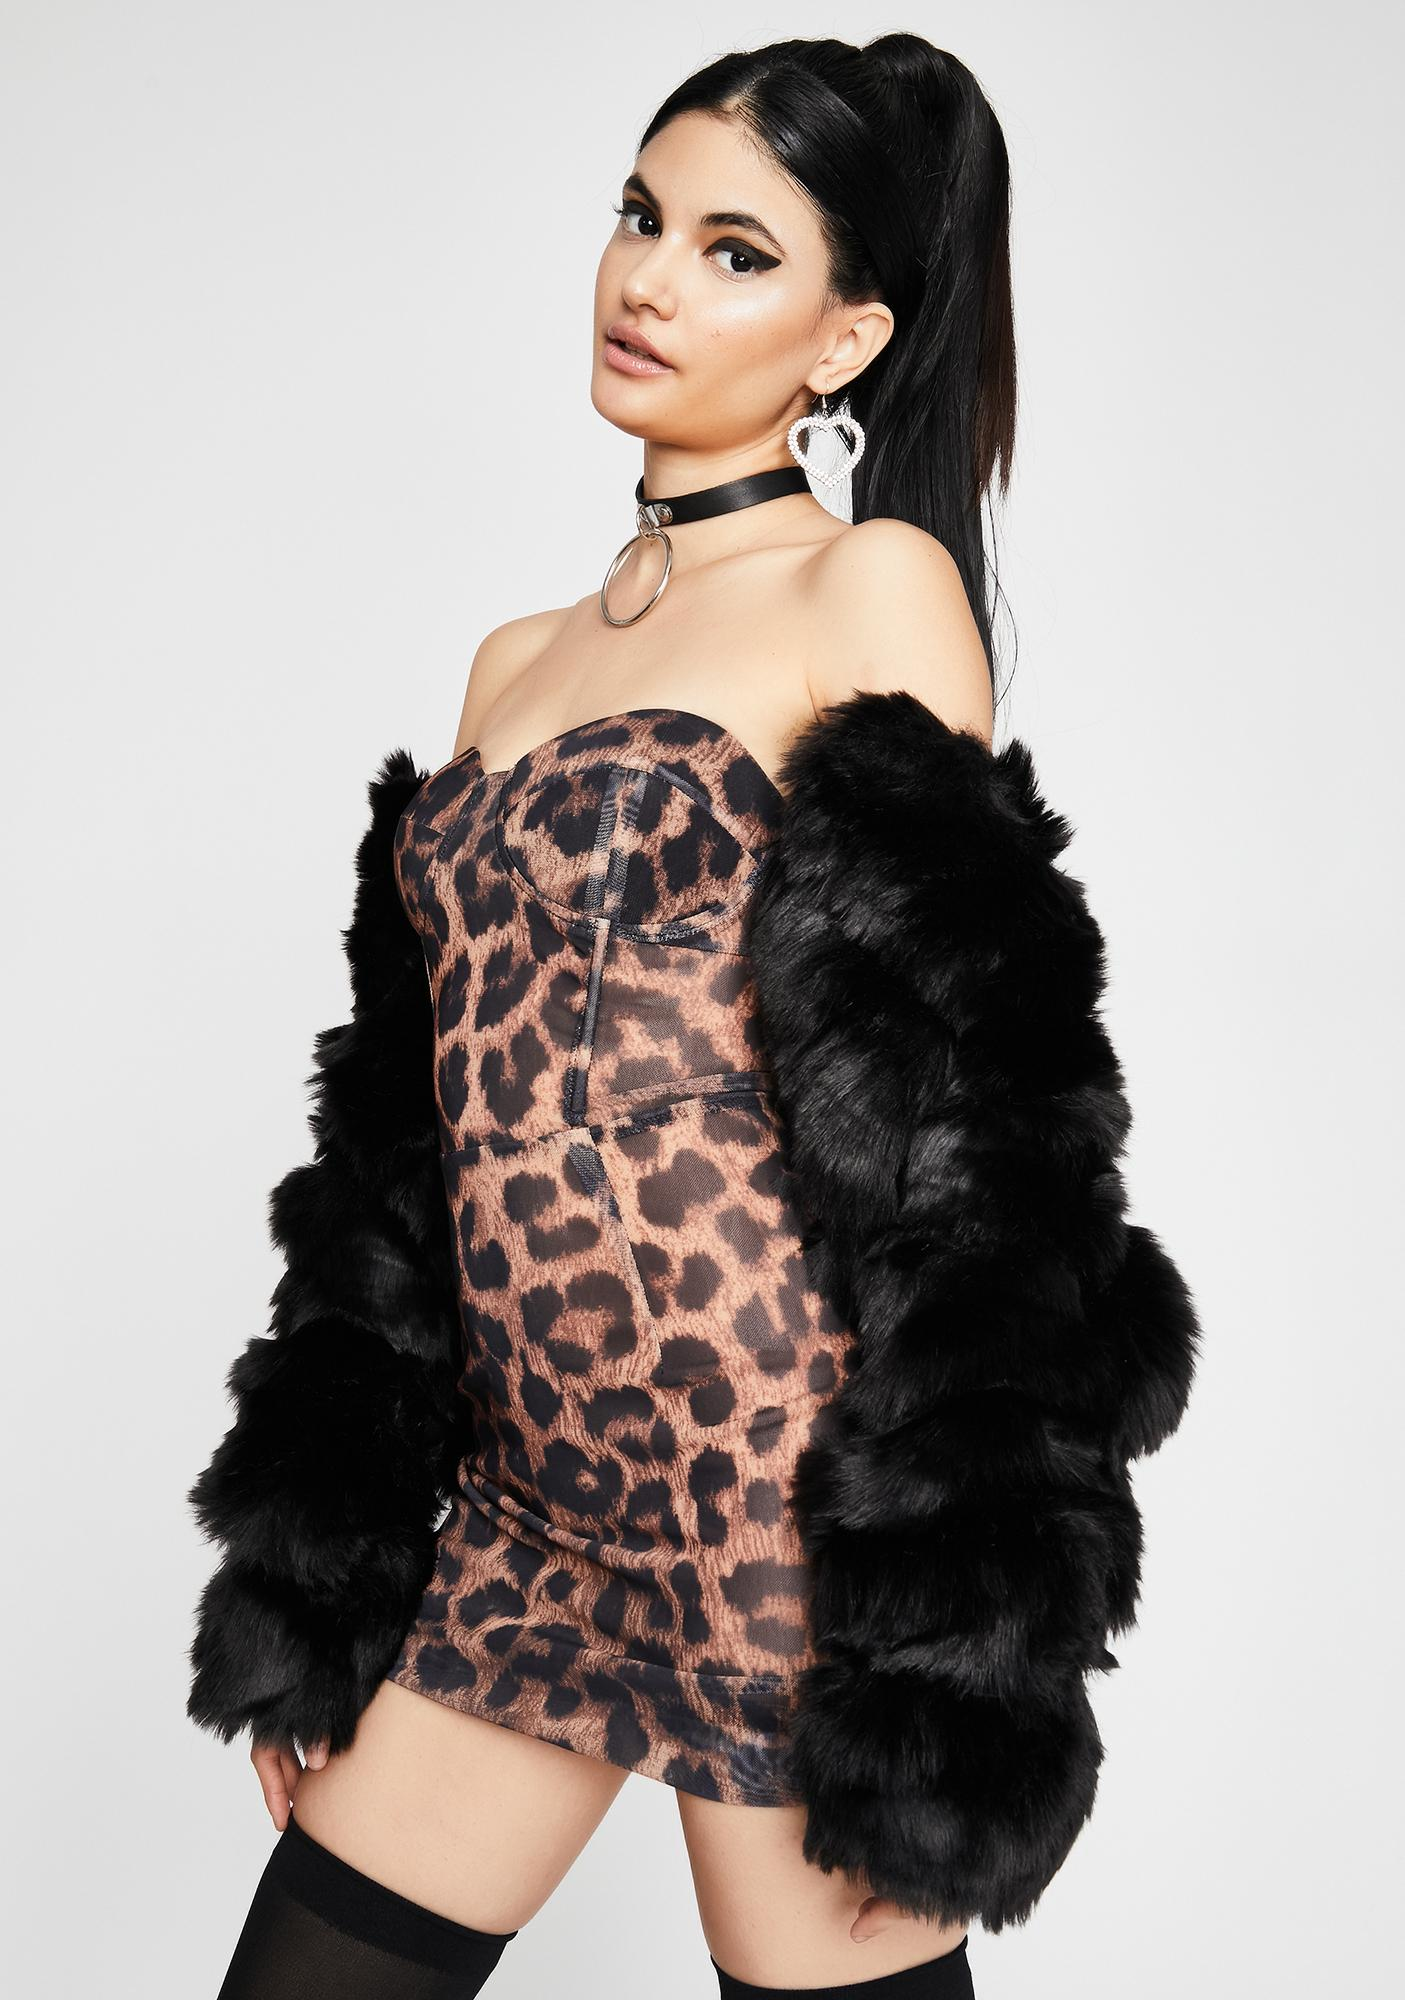 Caught Cheetin' Strapless Dress